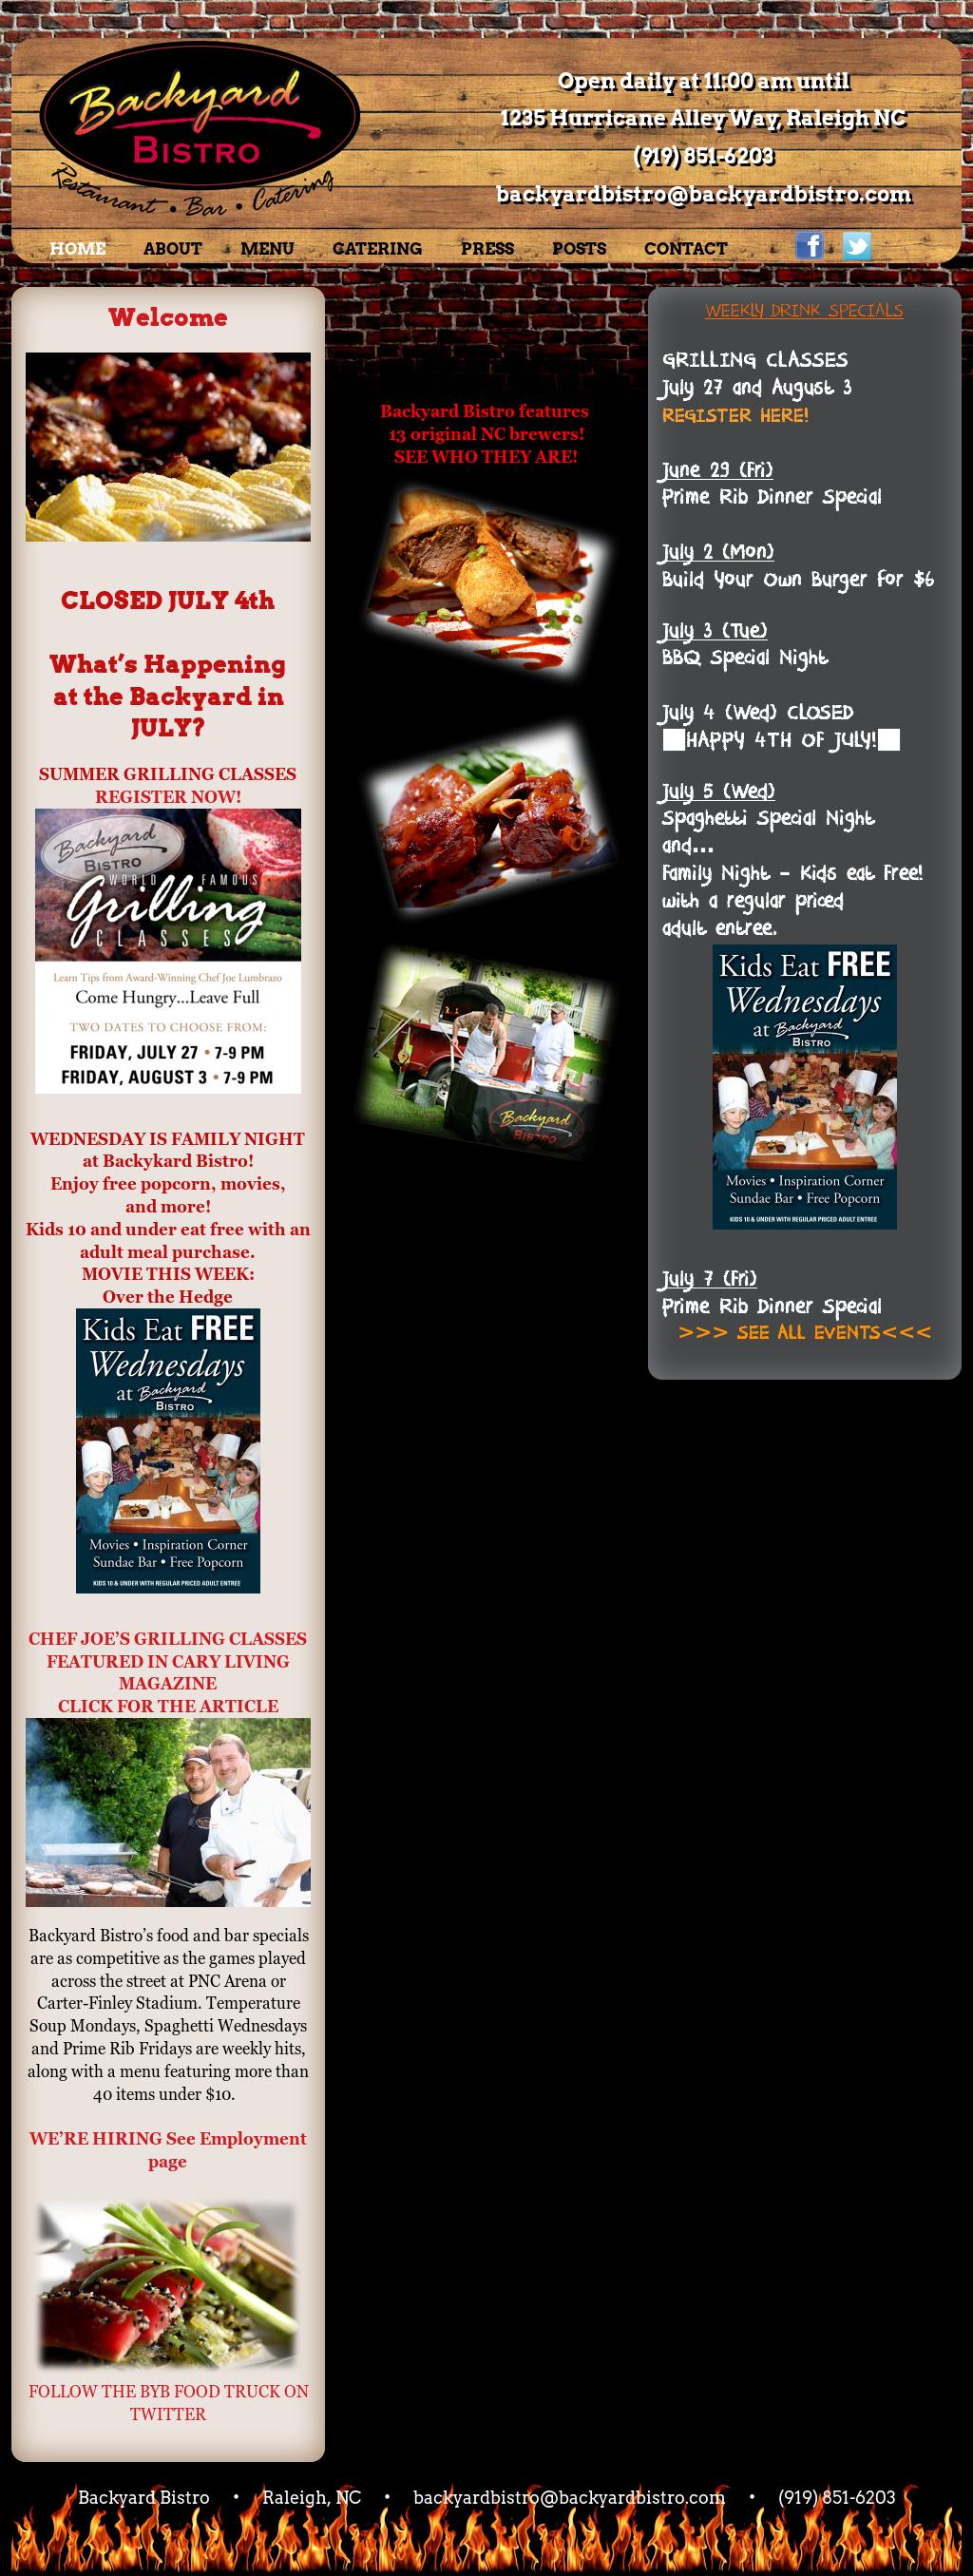 Backyard Bistro Website History